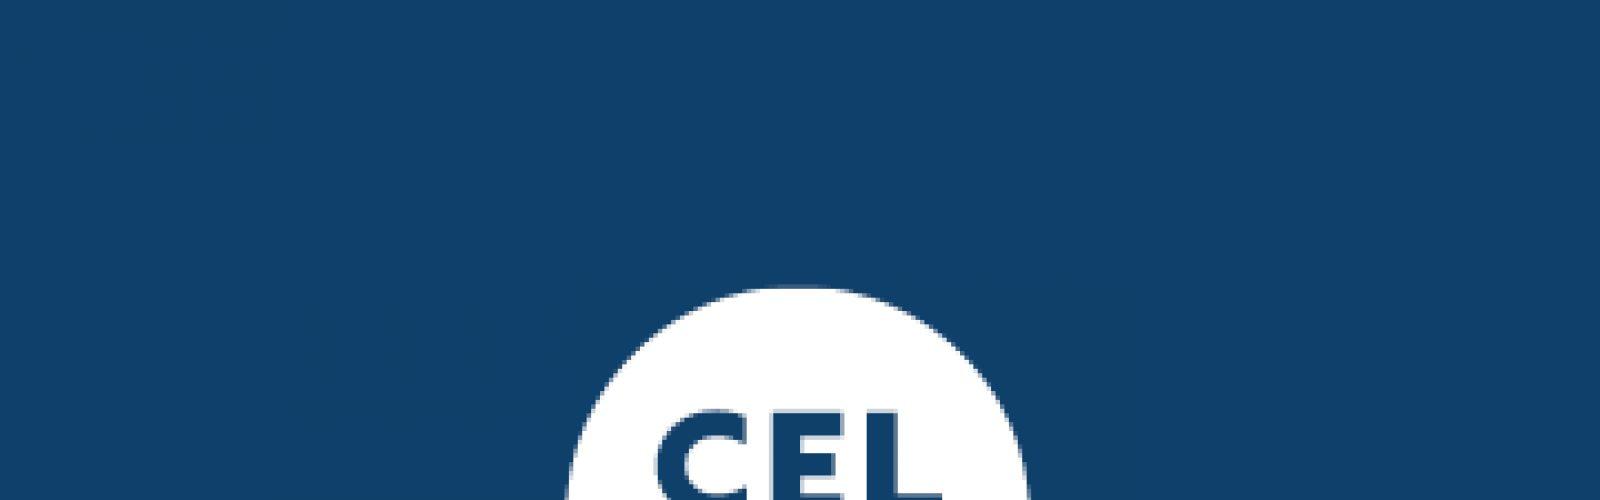 CEL Web Thumbnail dark Blue